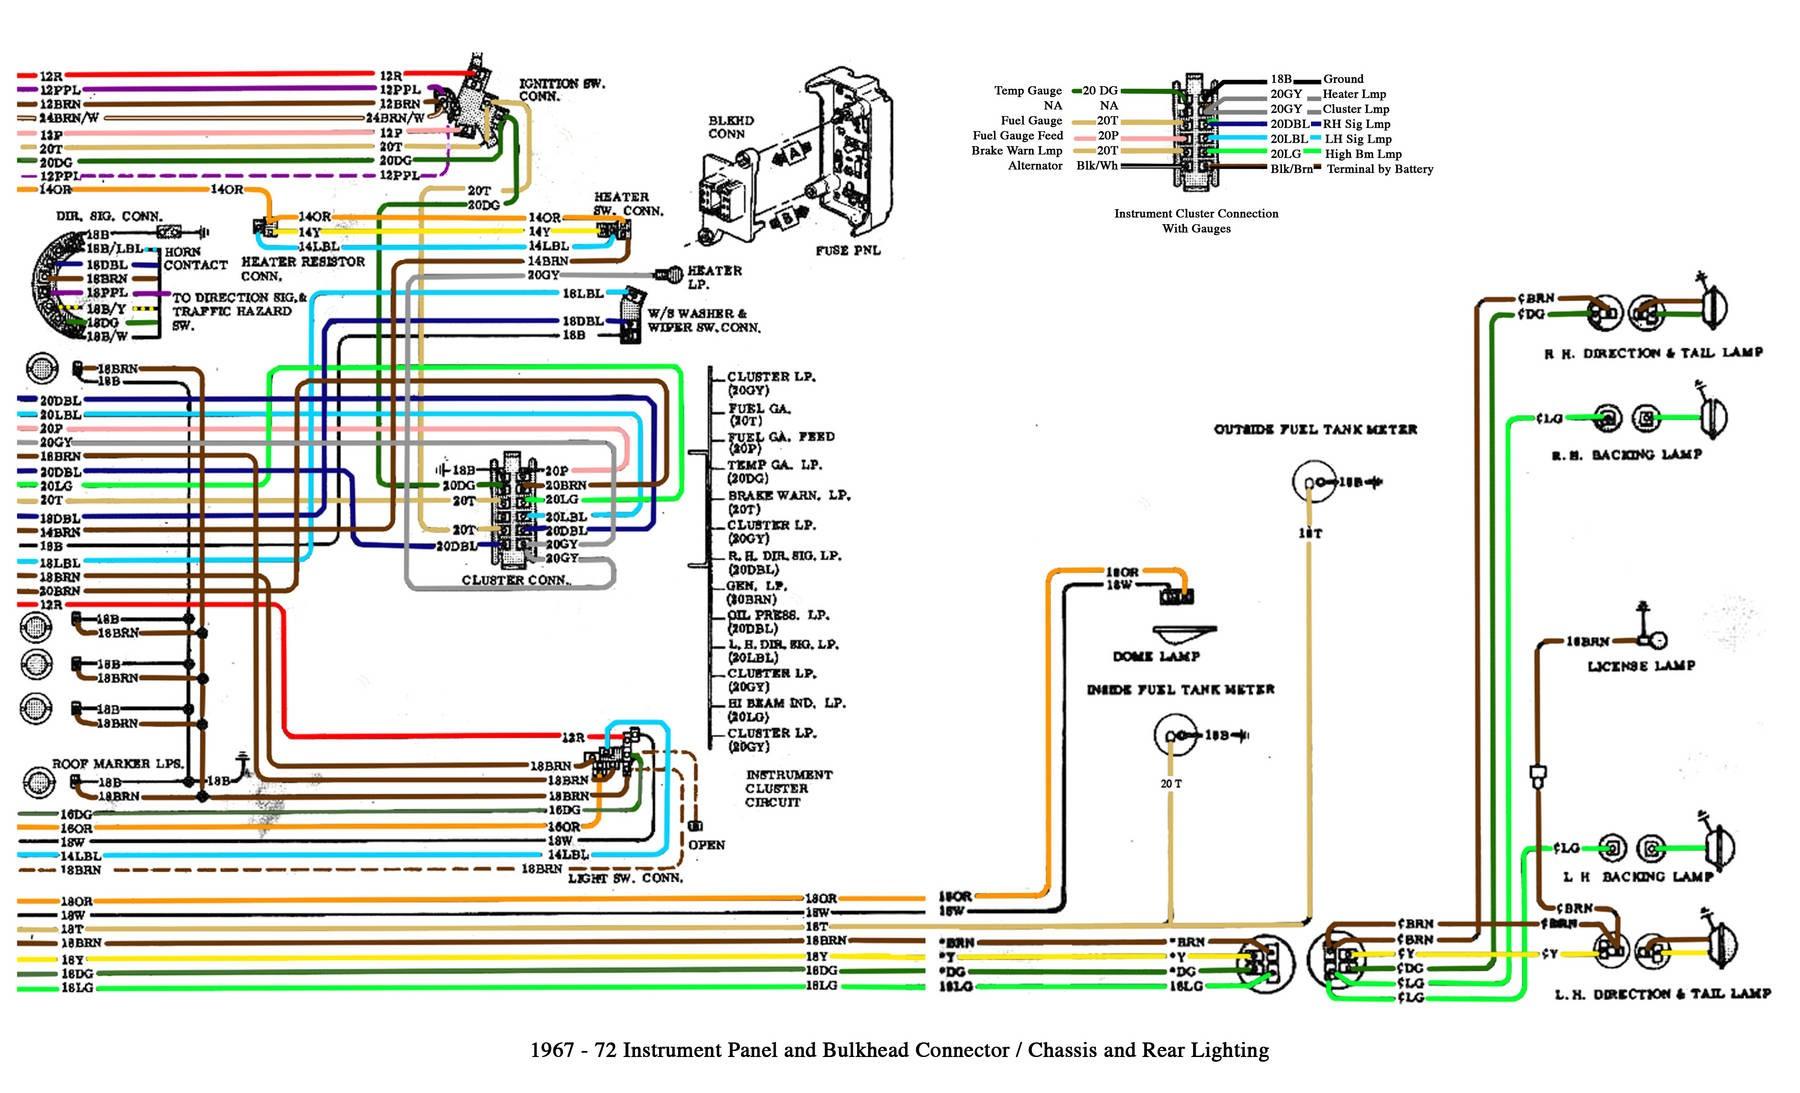 1995 chevrolet 1500 wiring diagram wiring circuit 1995 chevy c1500 wiring diagram wiring diagram schematic rh packagingmachine co 1995 chevy 1500 headlight wiring diagram 1995 chevy 1500 alternator wiring swarovskicordoba Gallery